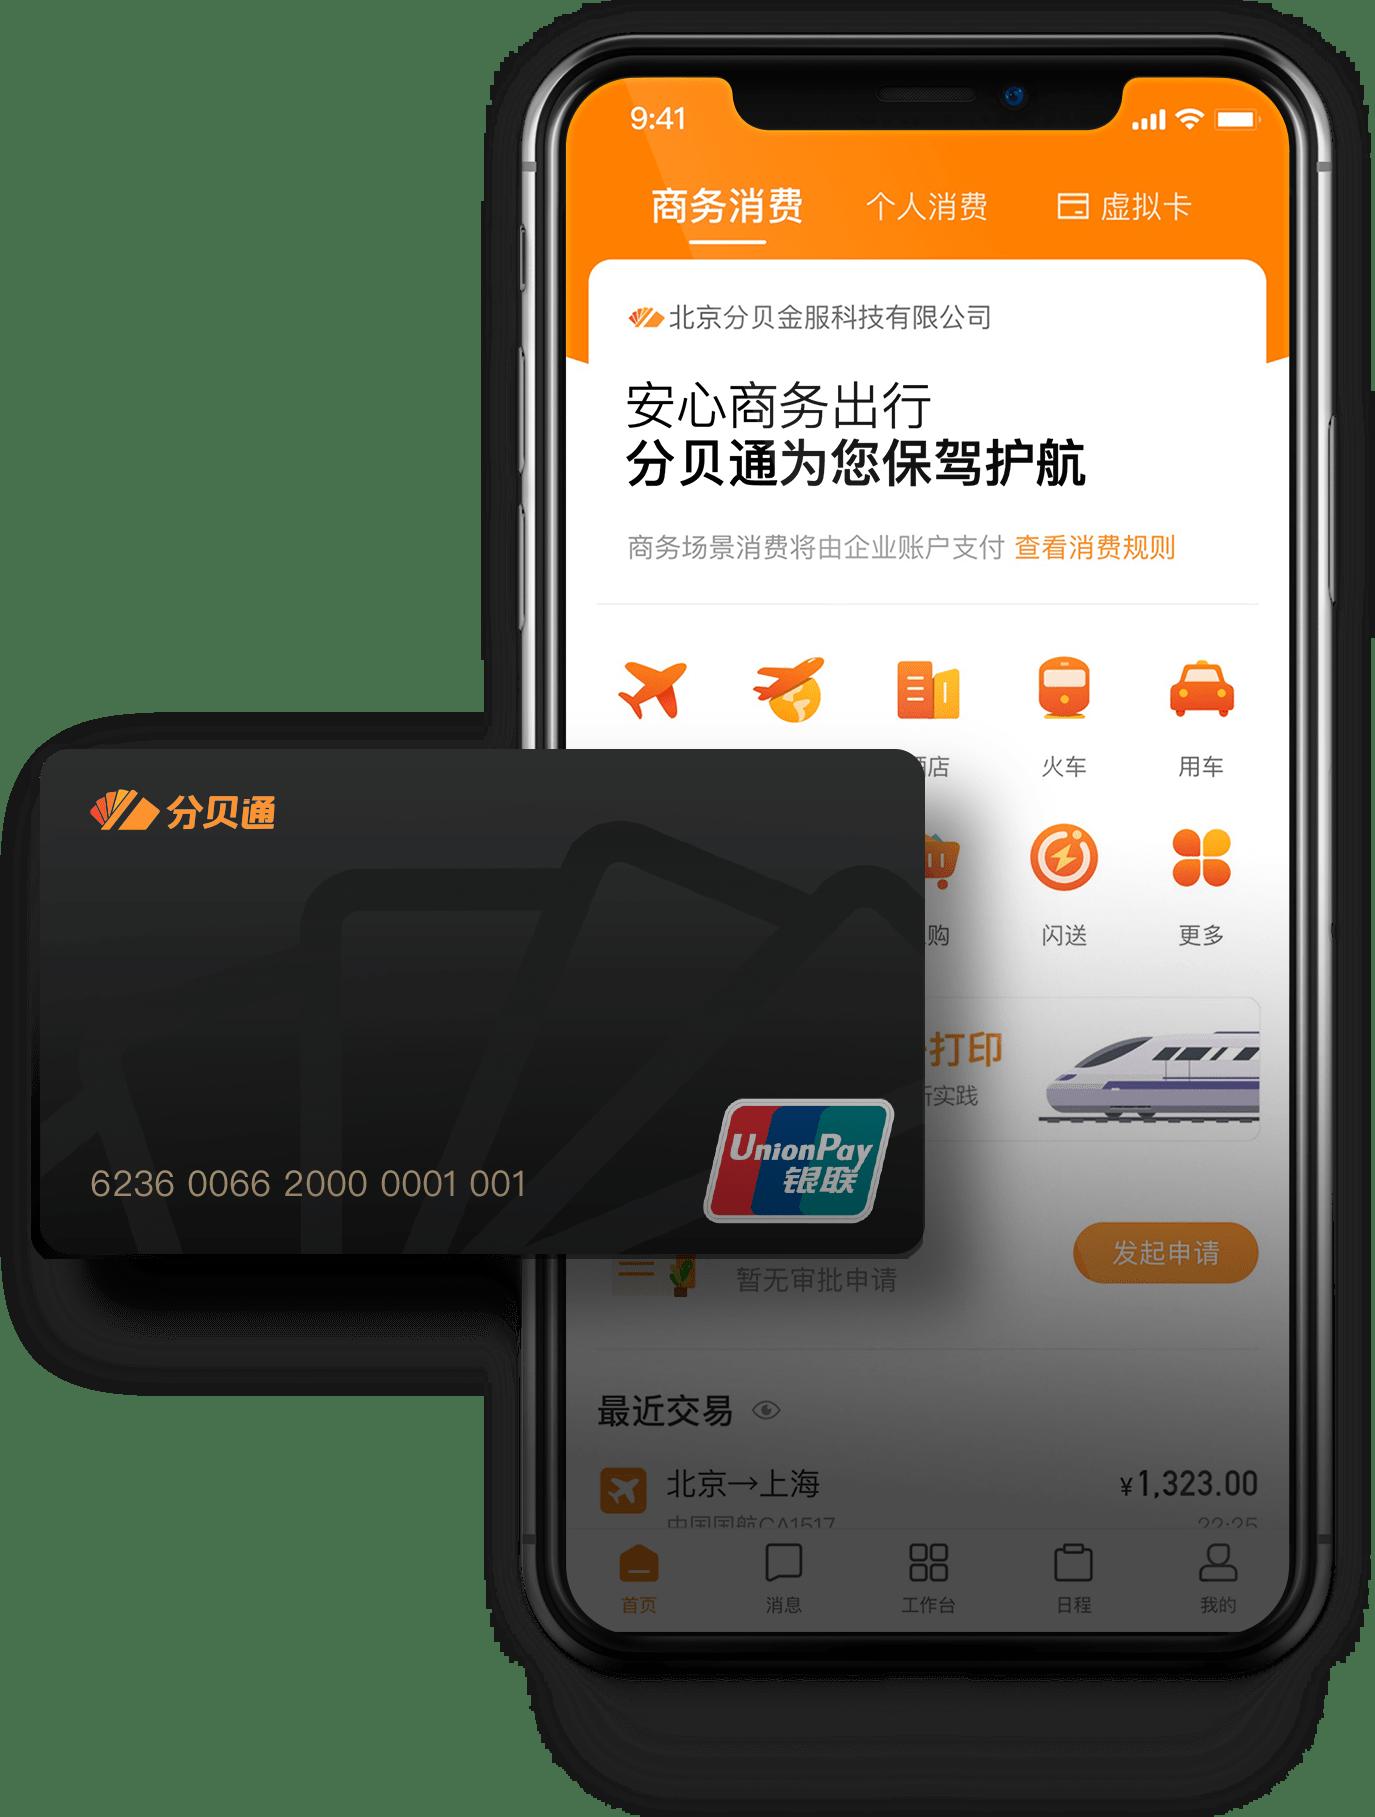 Fenbeitong mobile app and accompanying card, Fenbeitong.com